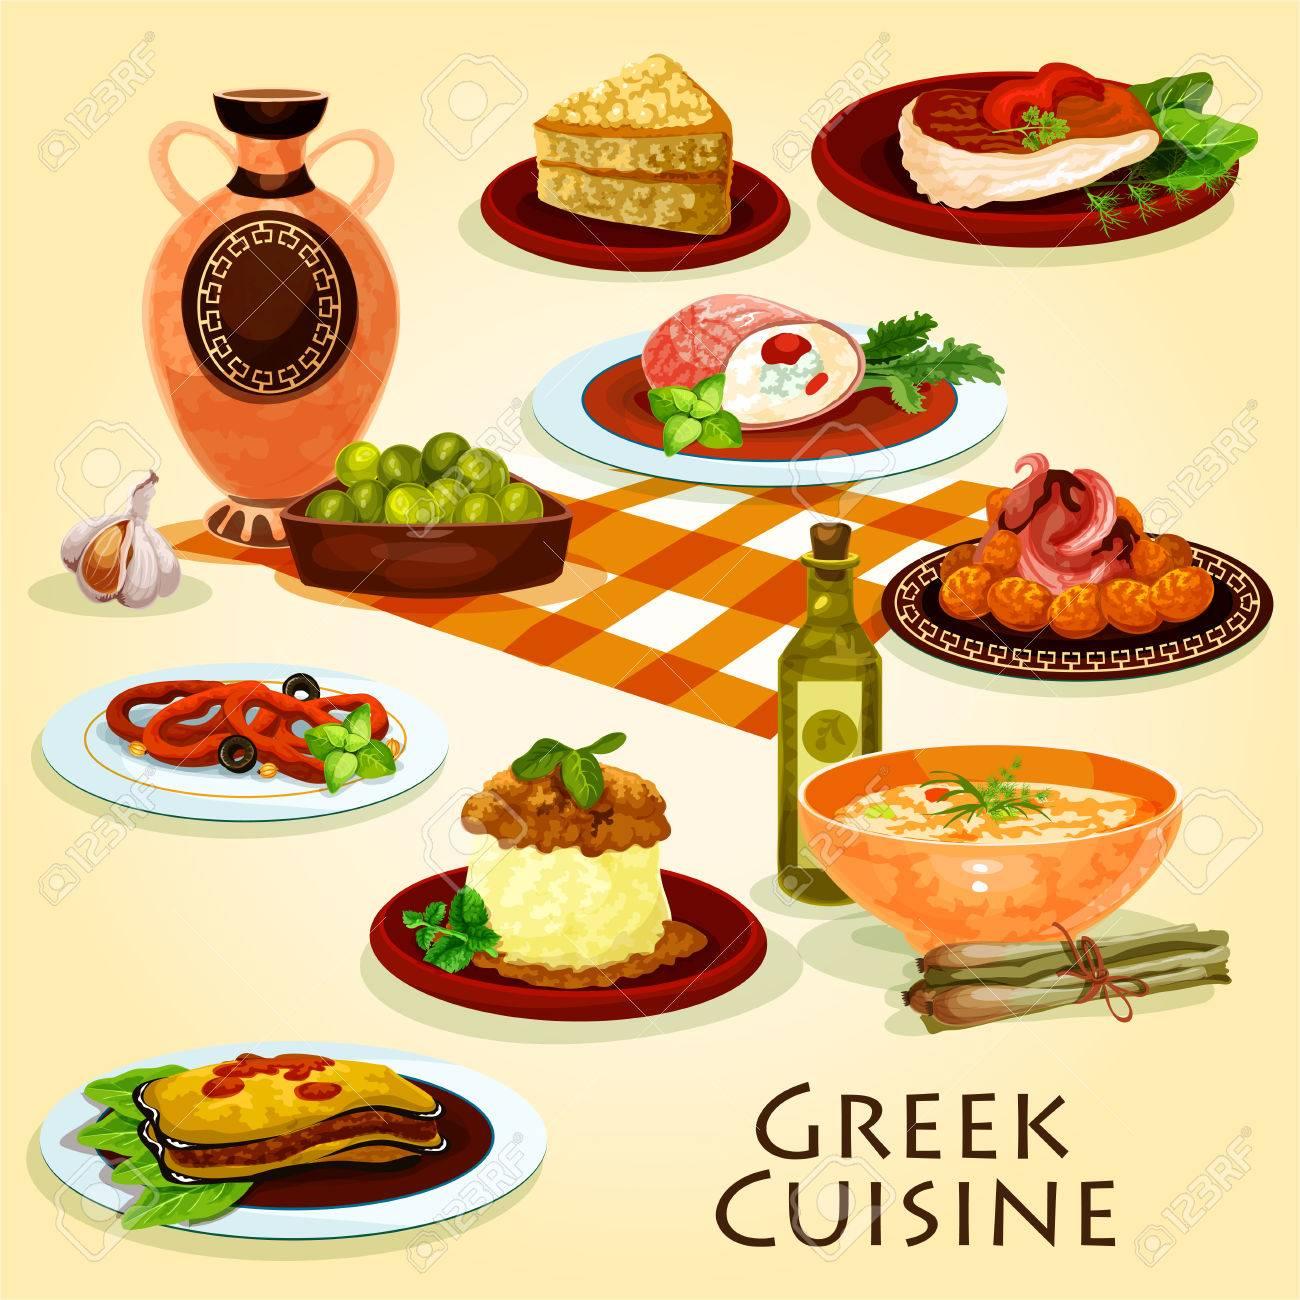 Cuisine Grecque Traditionnel Diner Icone De Dessin Anime Clip Art